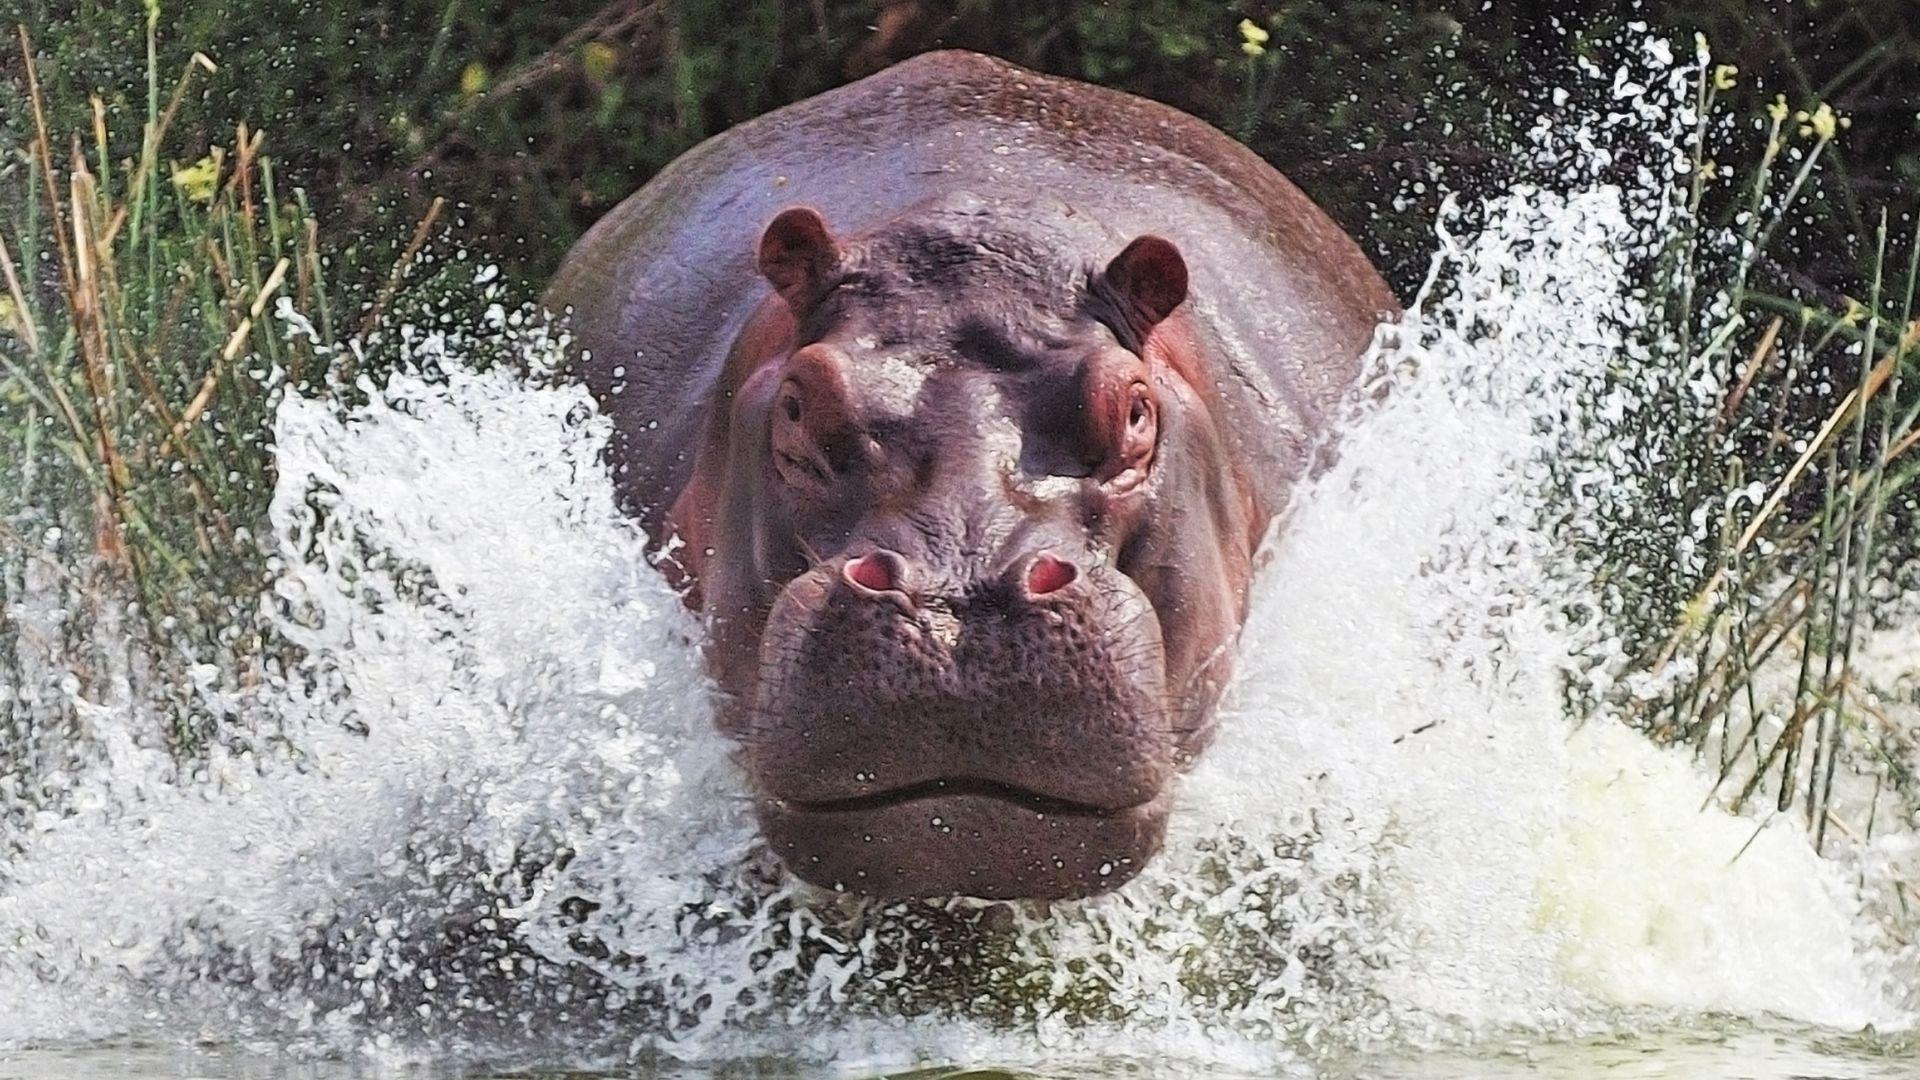 A Hippo In Africa